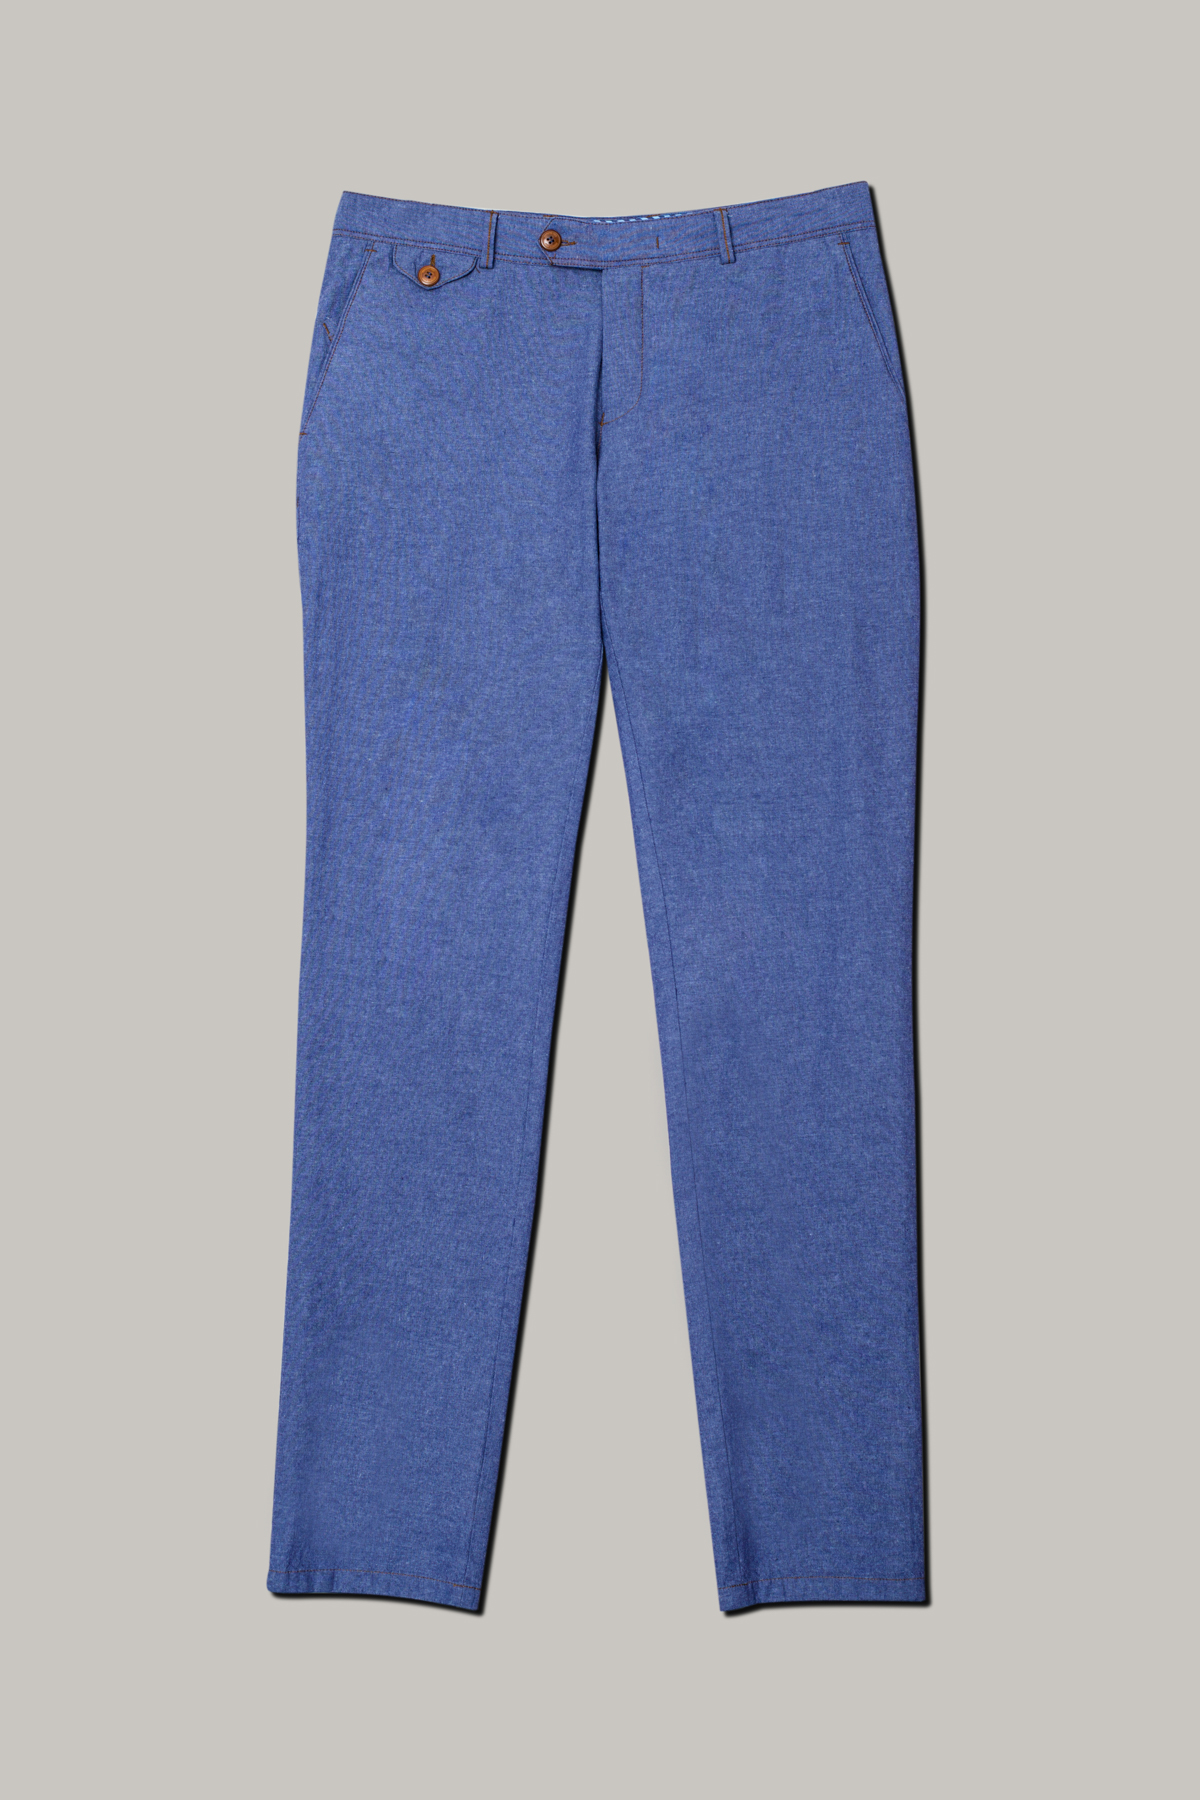 Брюки «chinos» из ткани «джинс» Vaismann  20307